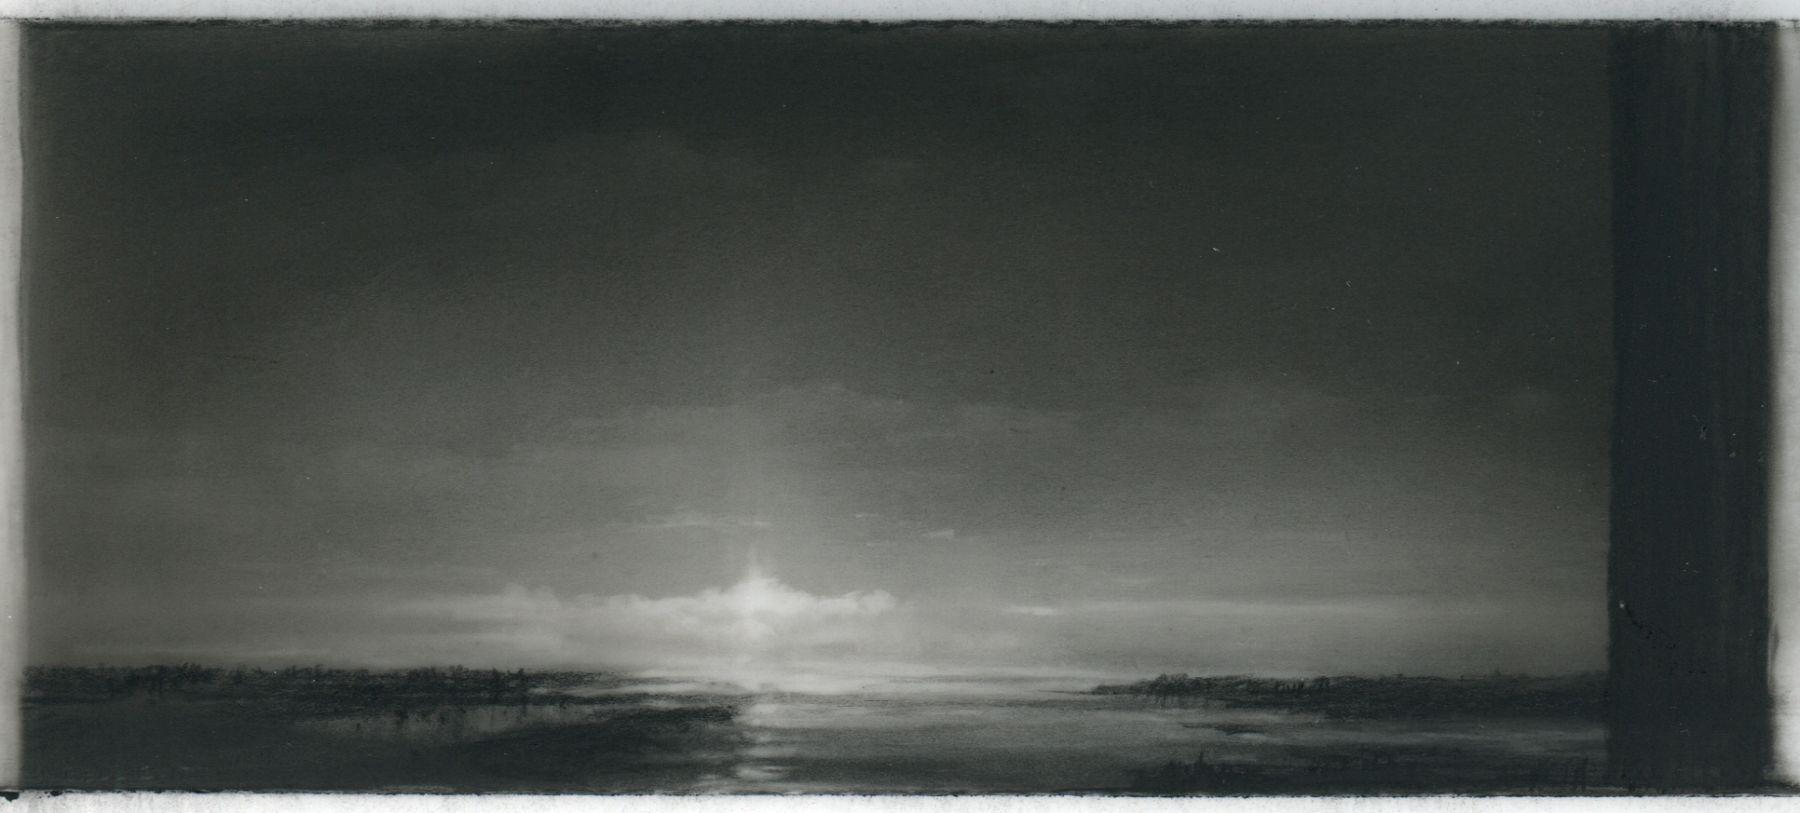 Dozier Bell, Morning shore, 2, 2018